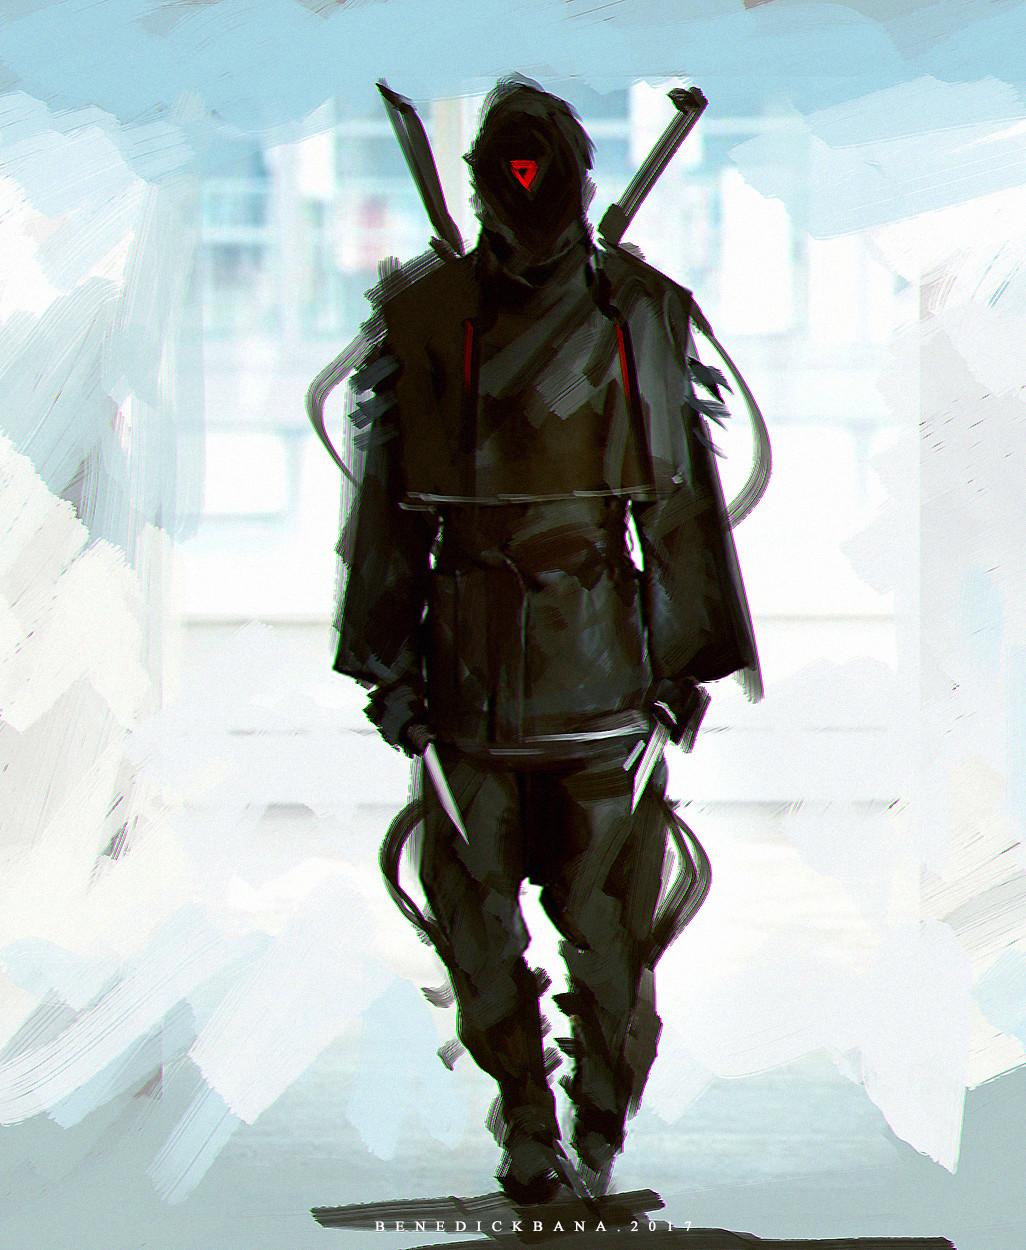 Benedick bana ninja lores